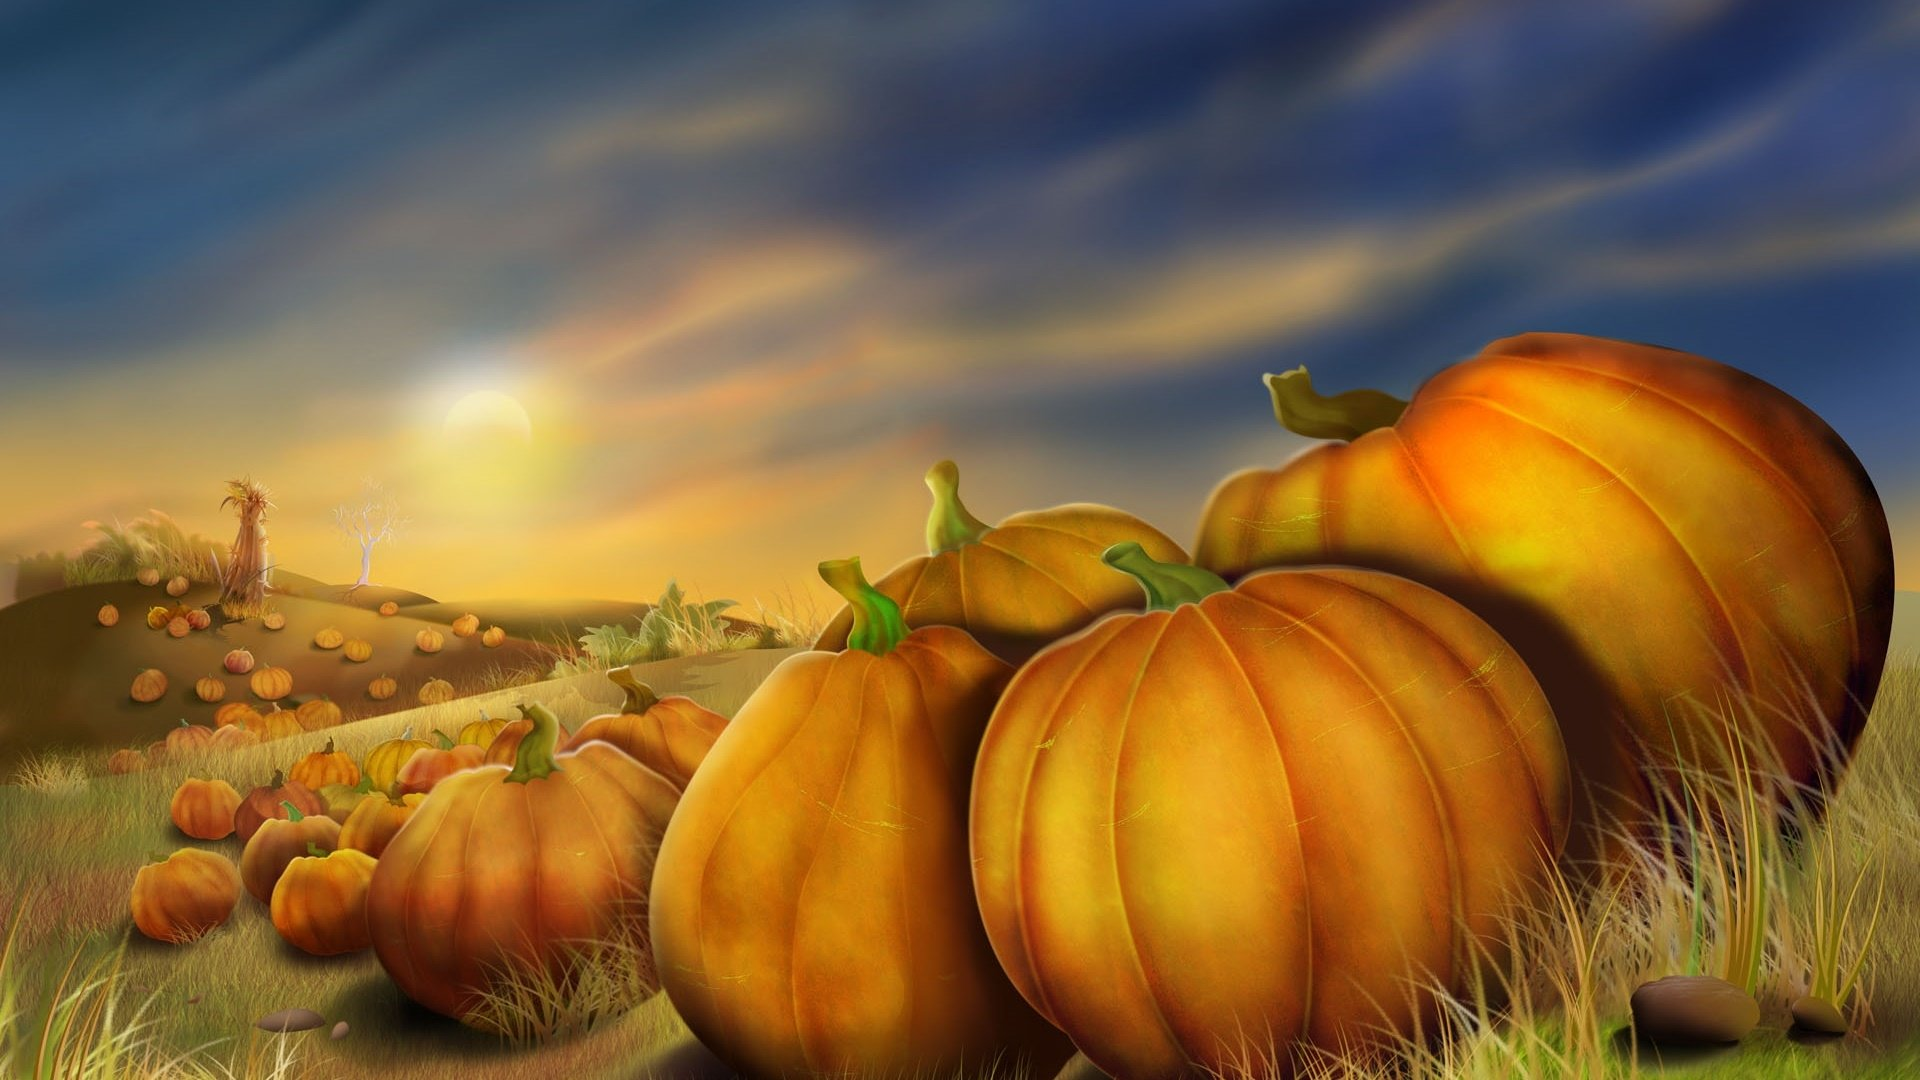 Thanksgiving Wallpaper 1920x1080